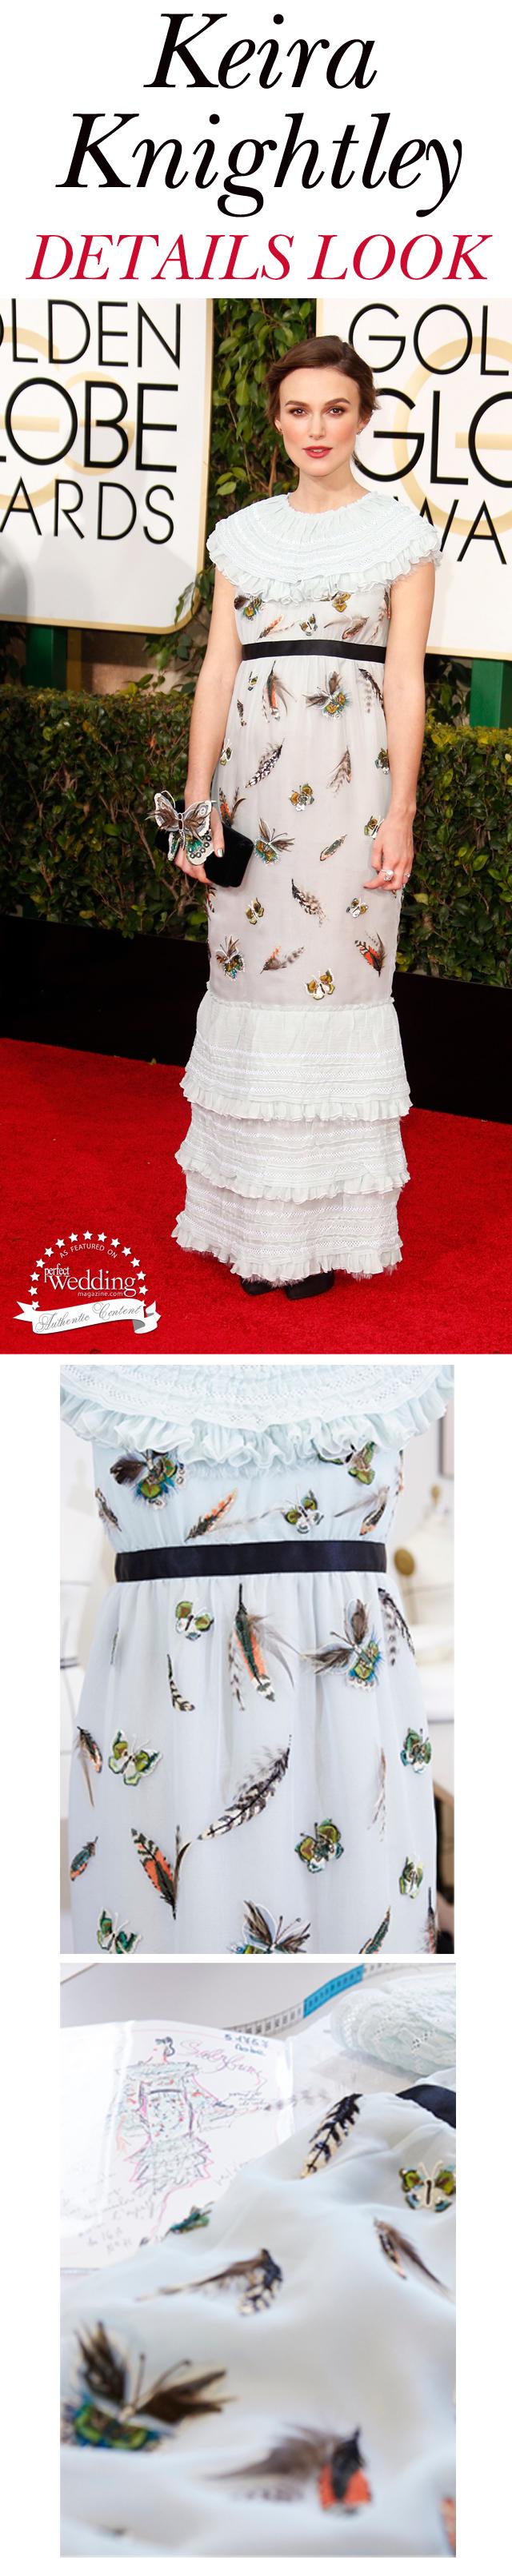 Keira Knightley, Chanel, Chanel Paris-Salzburg 2014-15, Chanel Beauty, Chanel Fine Jewellery, Perfect Wedding Magazine, David Lam Park. Perfect Wedding Magazine Blog, Chanel Wedding Inspiration